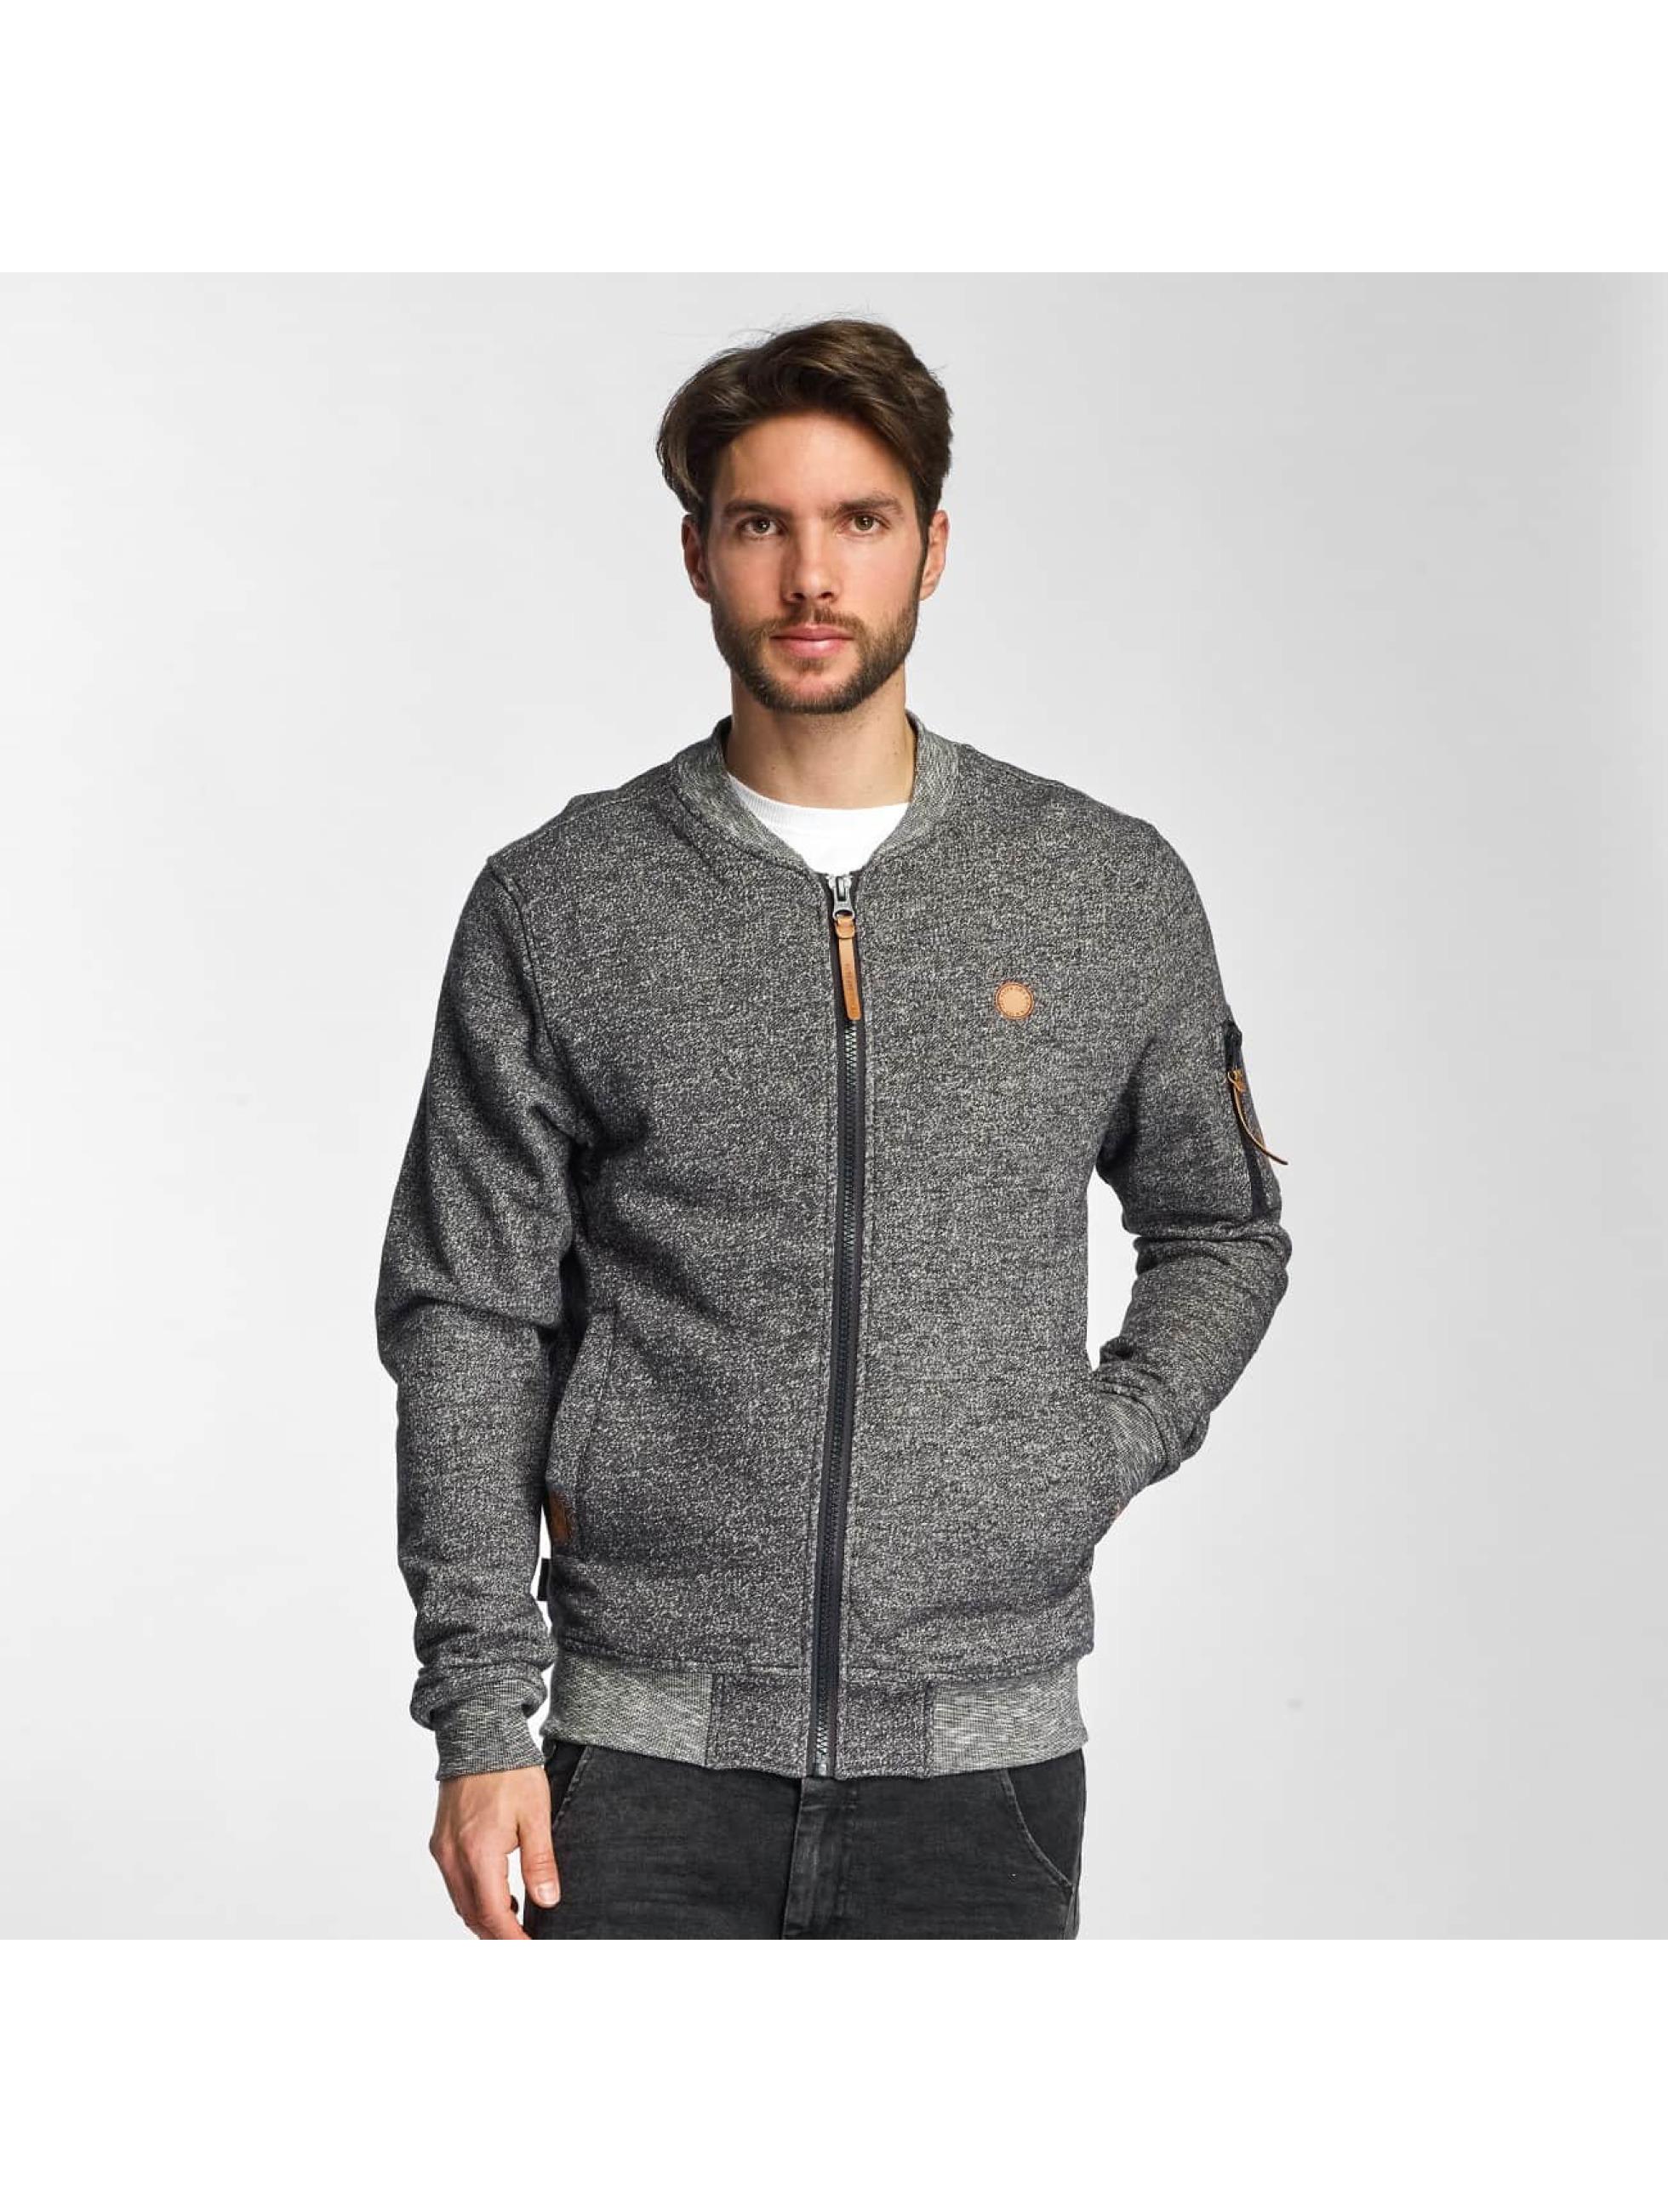 Alife & Kickin Ethan Sweat Bomber Jacket Graphite Sale Angebote Reuthen